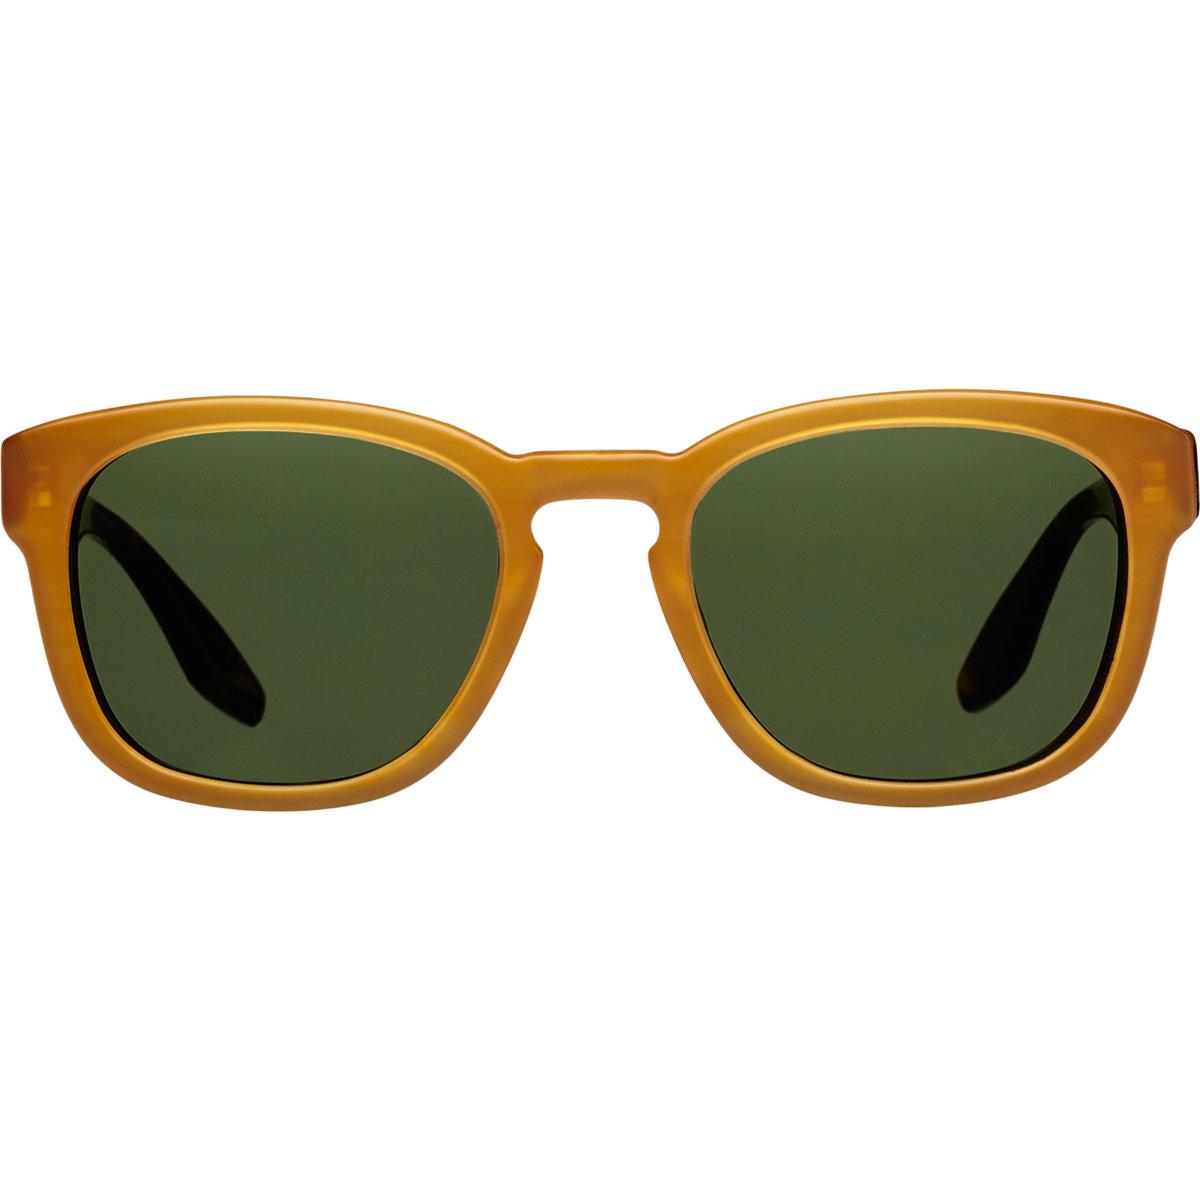 Lyst - Barton Perreira Men\'s Nelson Sunglasses in Natural for Men